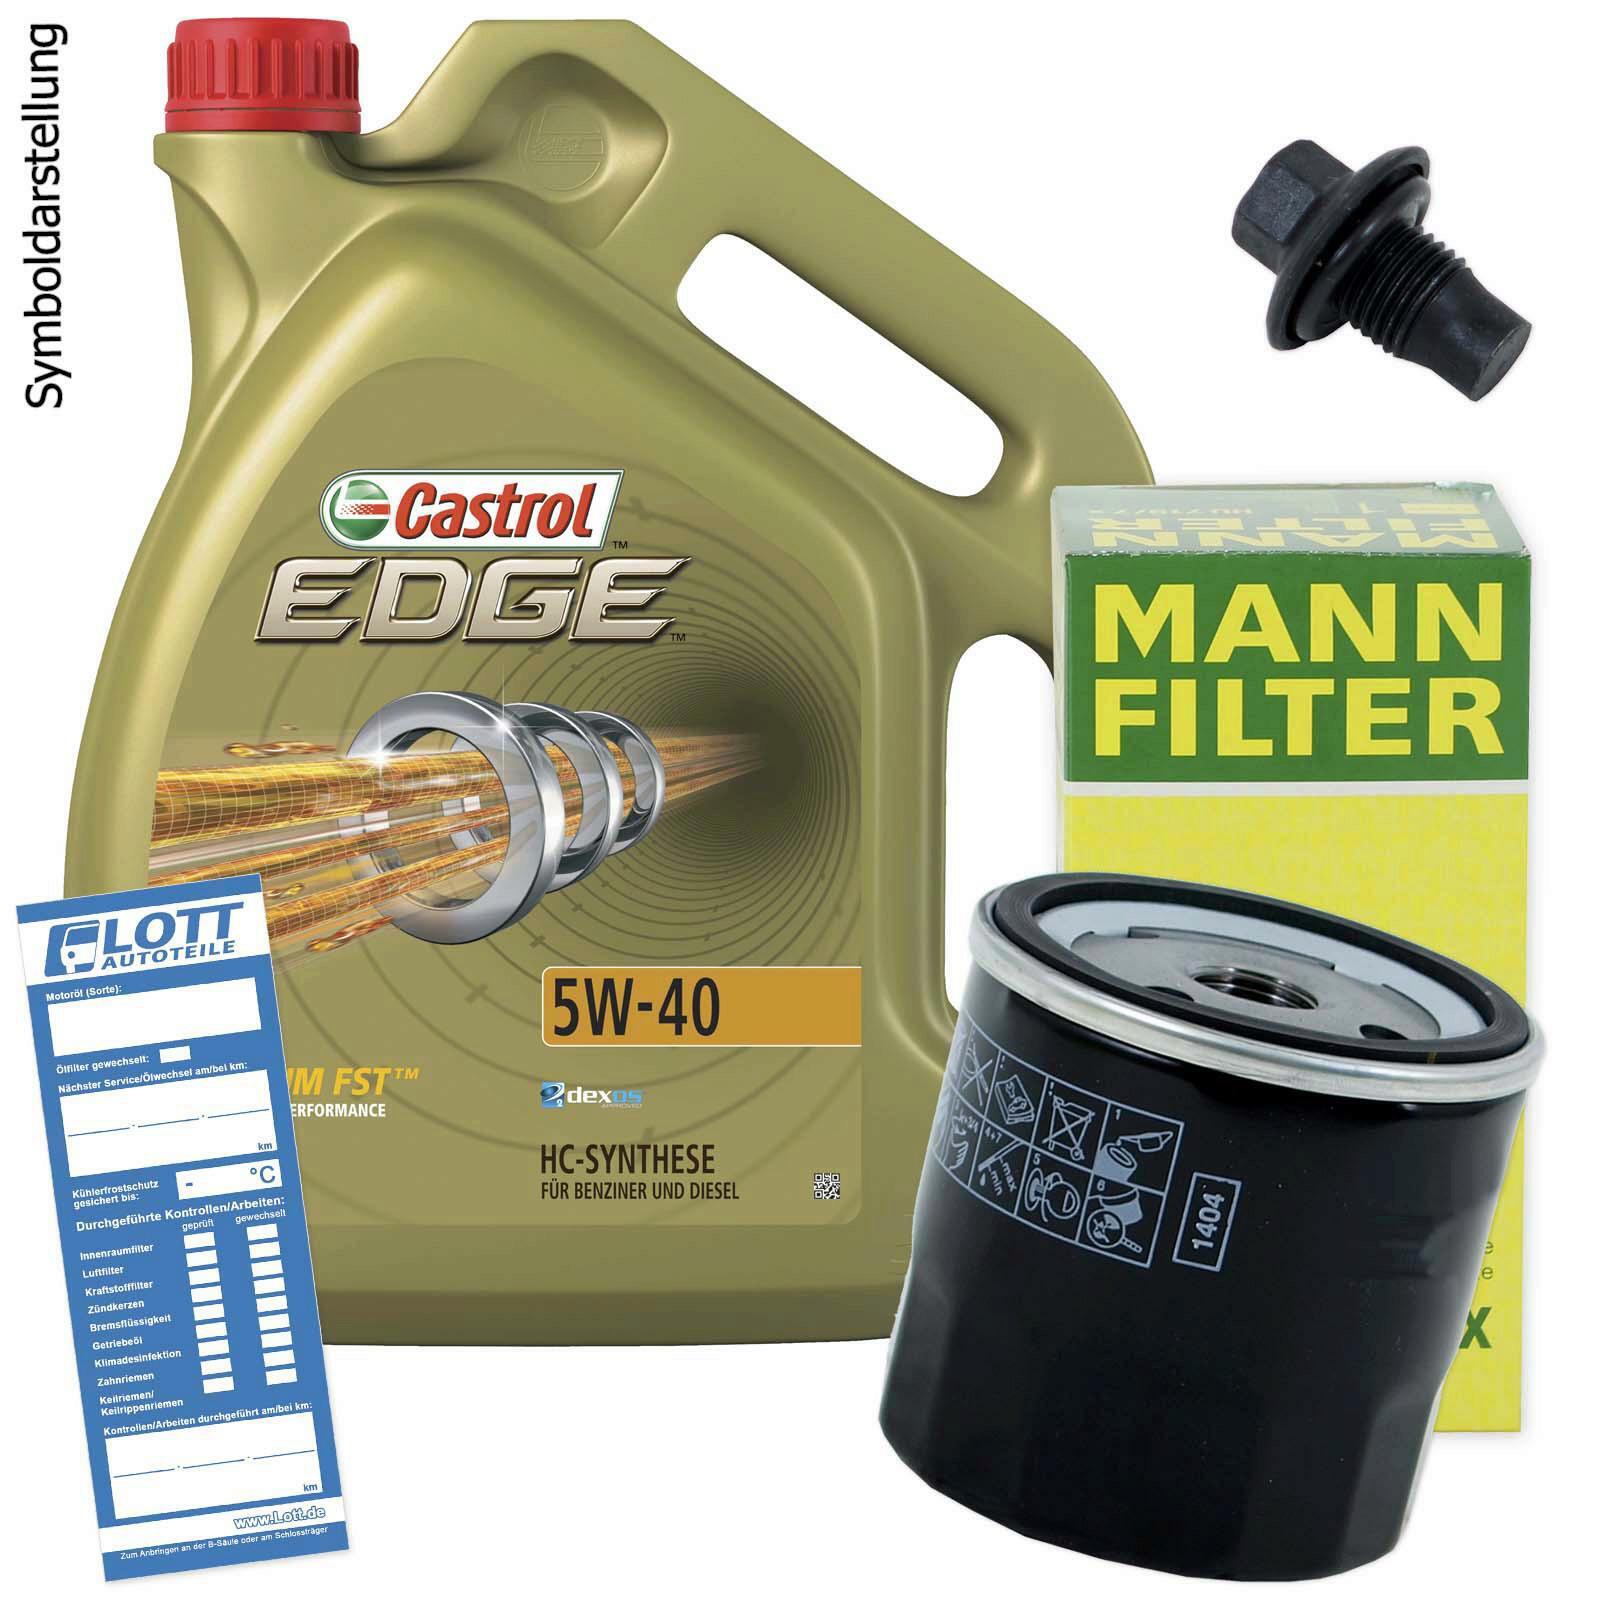 Ölwechsel Set 5L 5W40 Öl Motoröl CASTROL + MANN Ölfilter + Ablassschraube